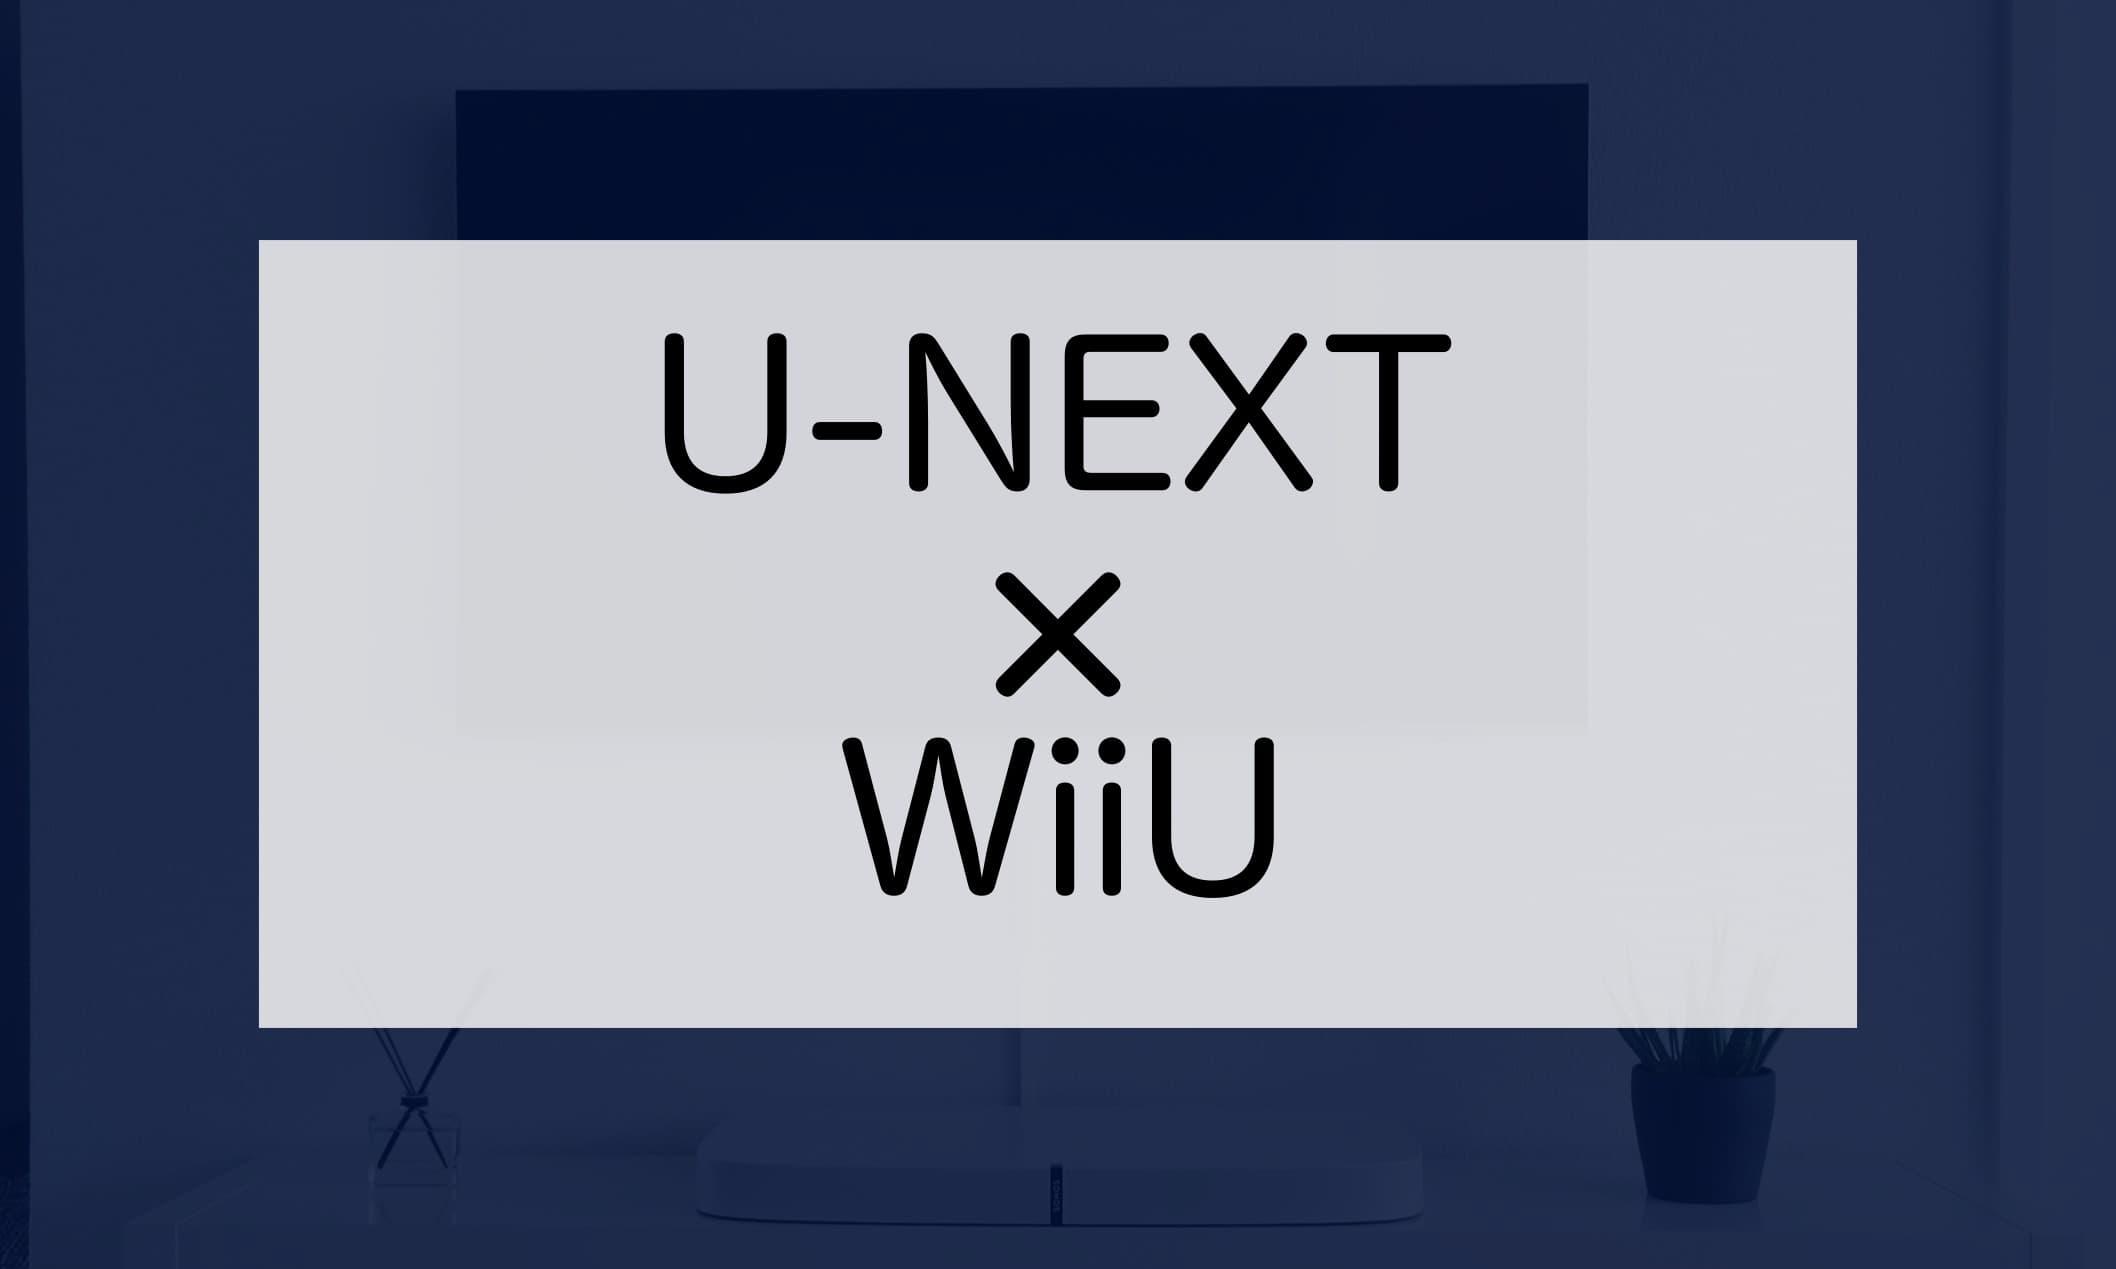 U-NEXTはWiiUで視聴可能なのか?